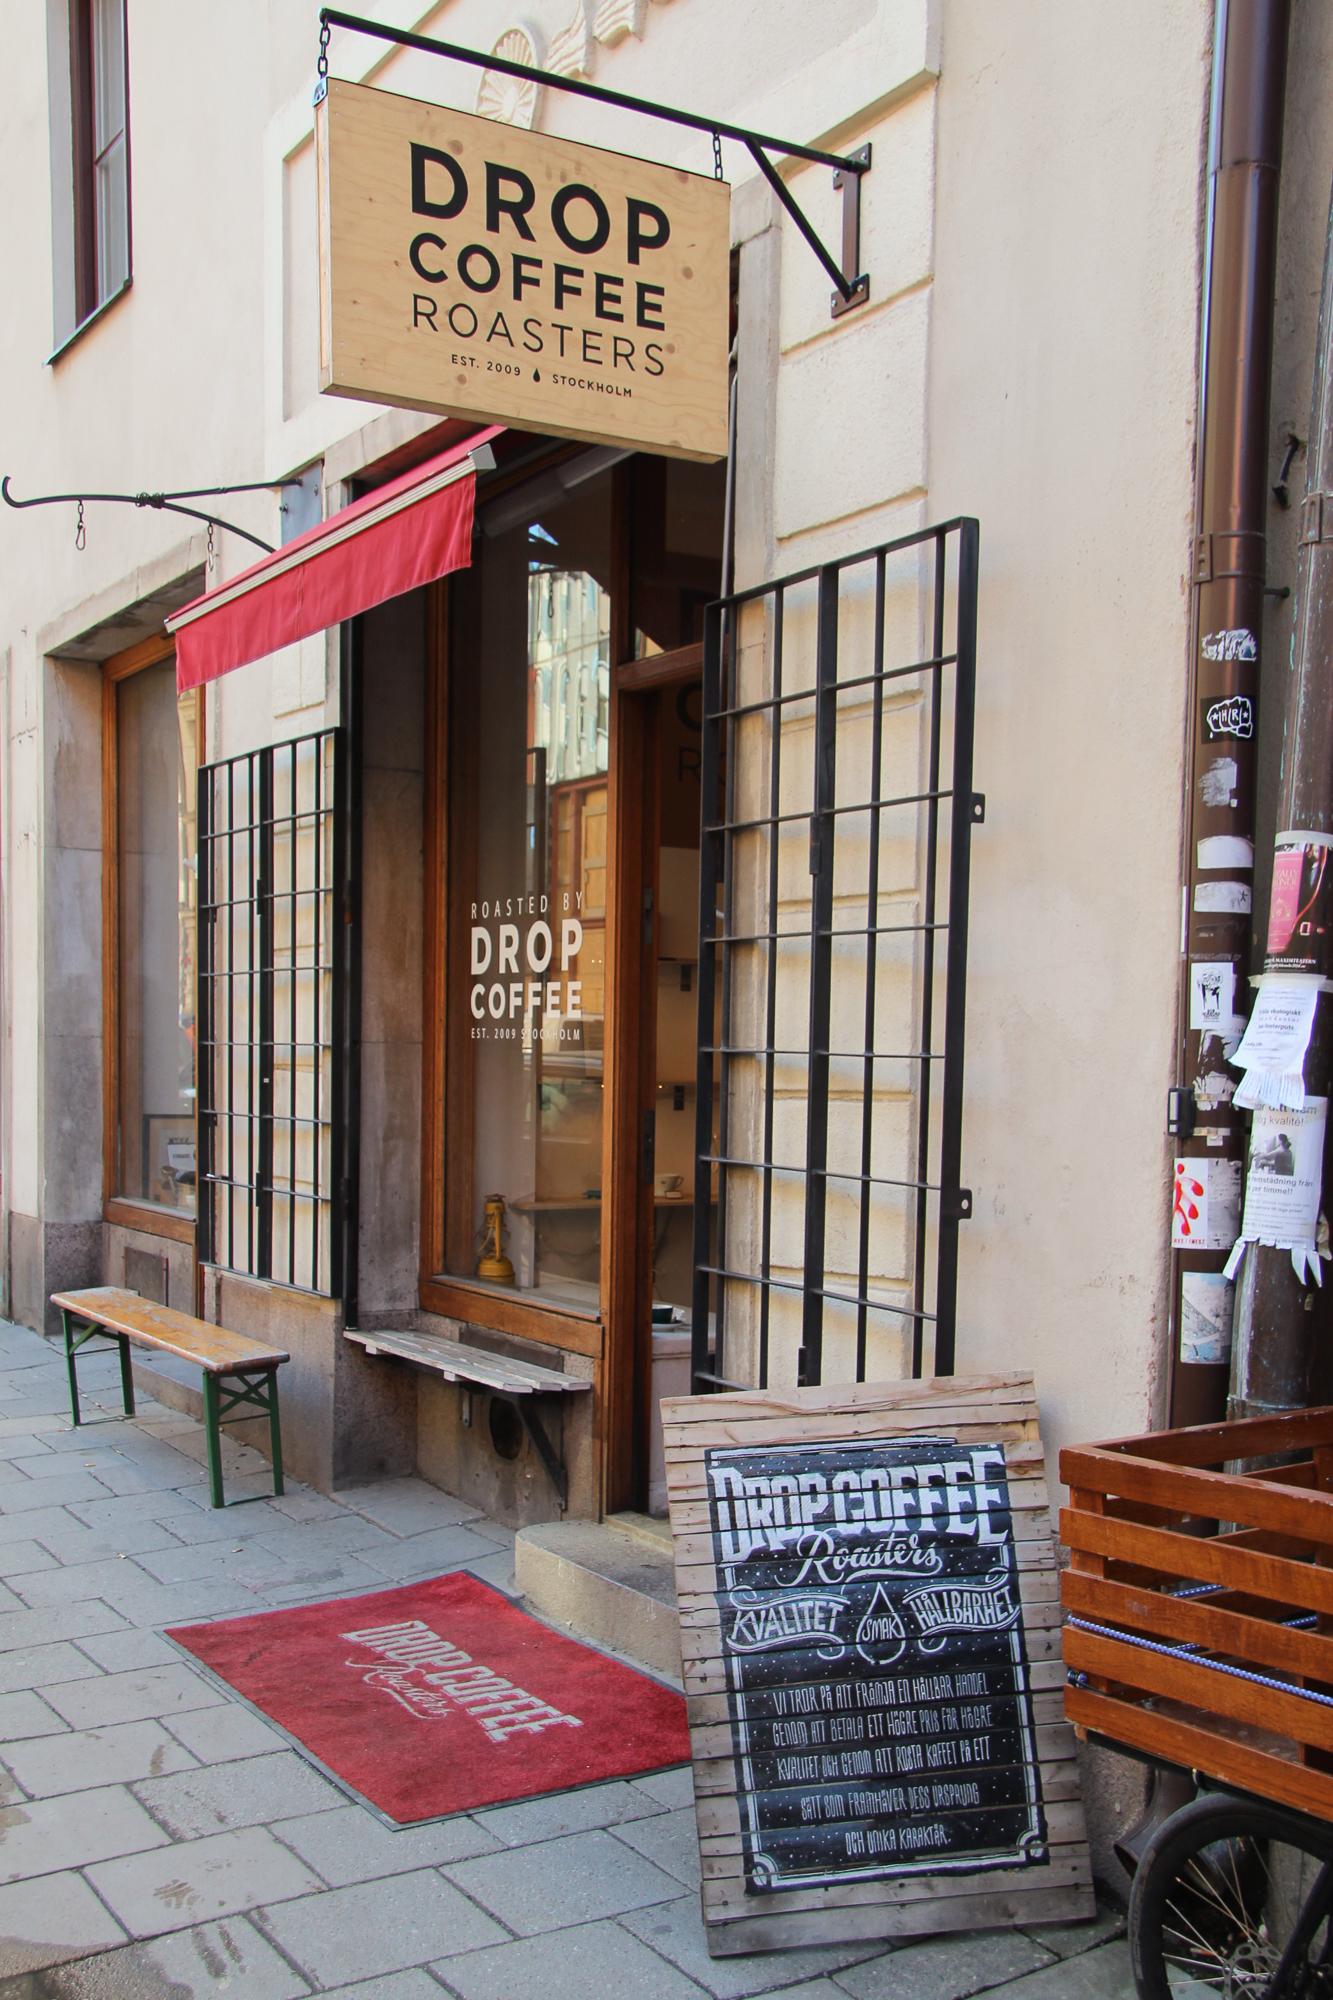 onthesamepage_blog_dropcoffee_stockholm